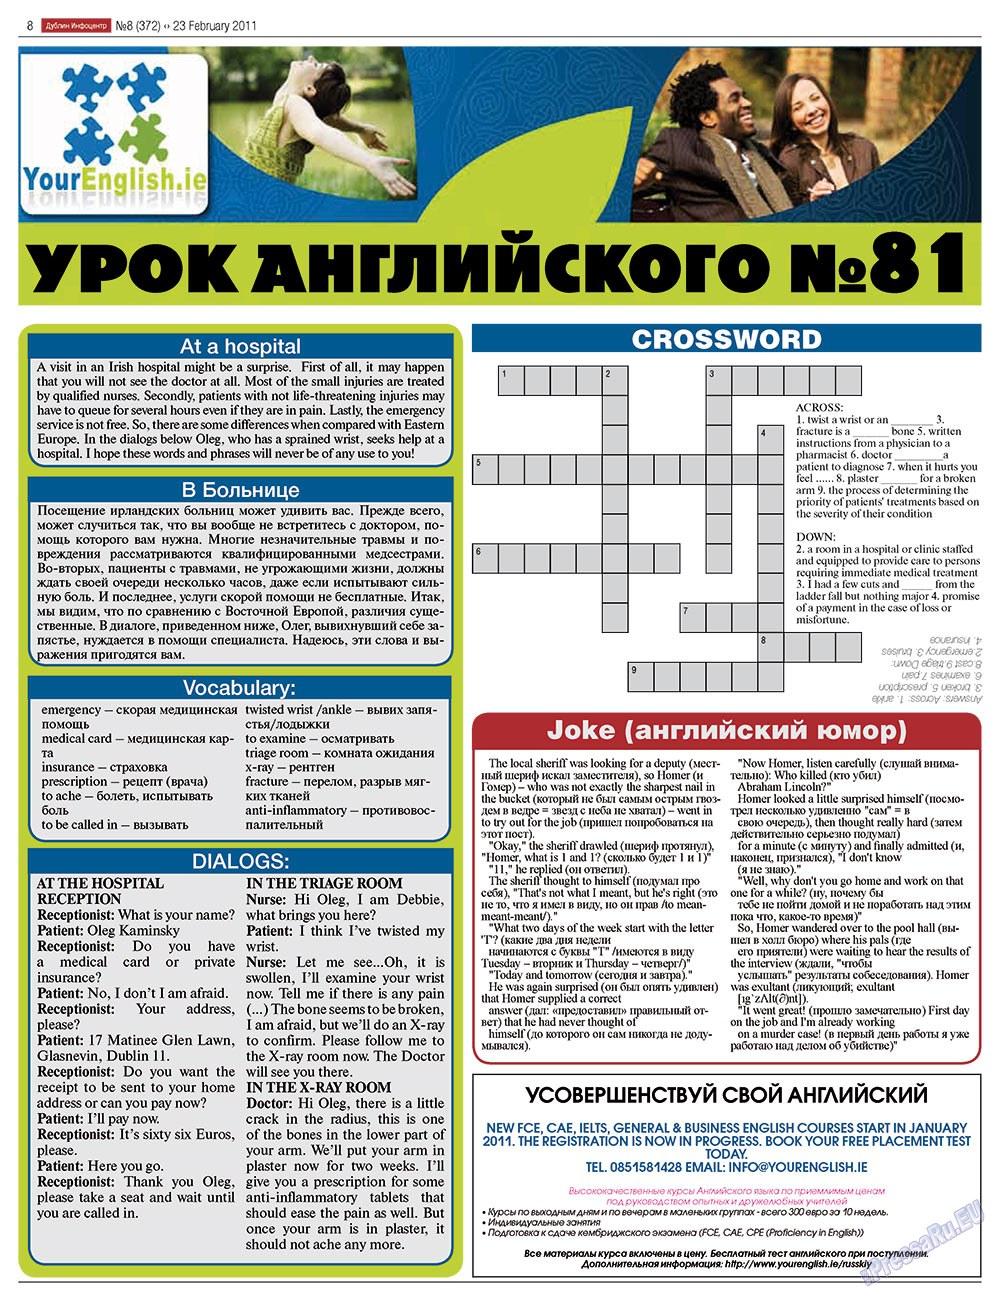 Дублин инфоцентр (газета). 2011 год, номер 8, стр. 8